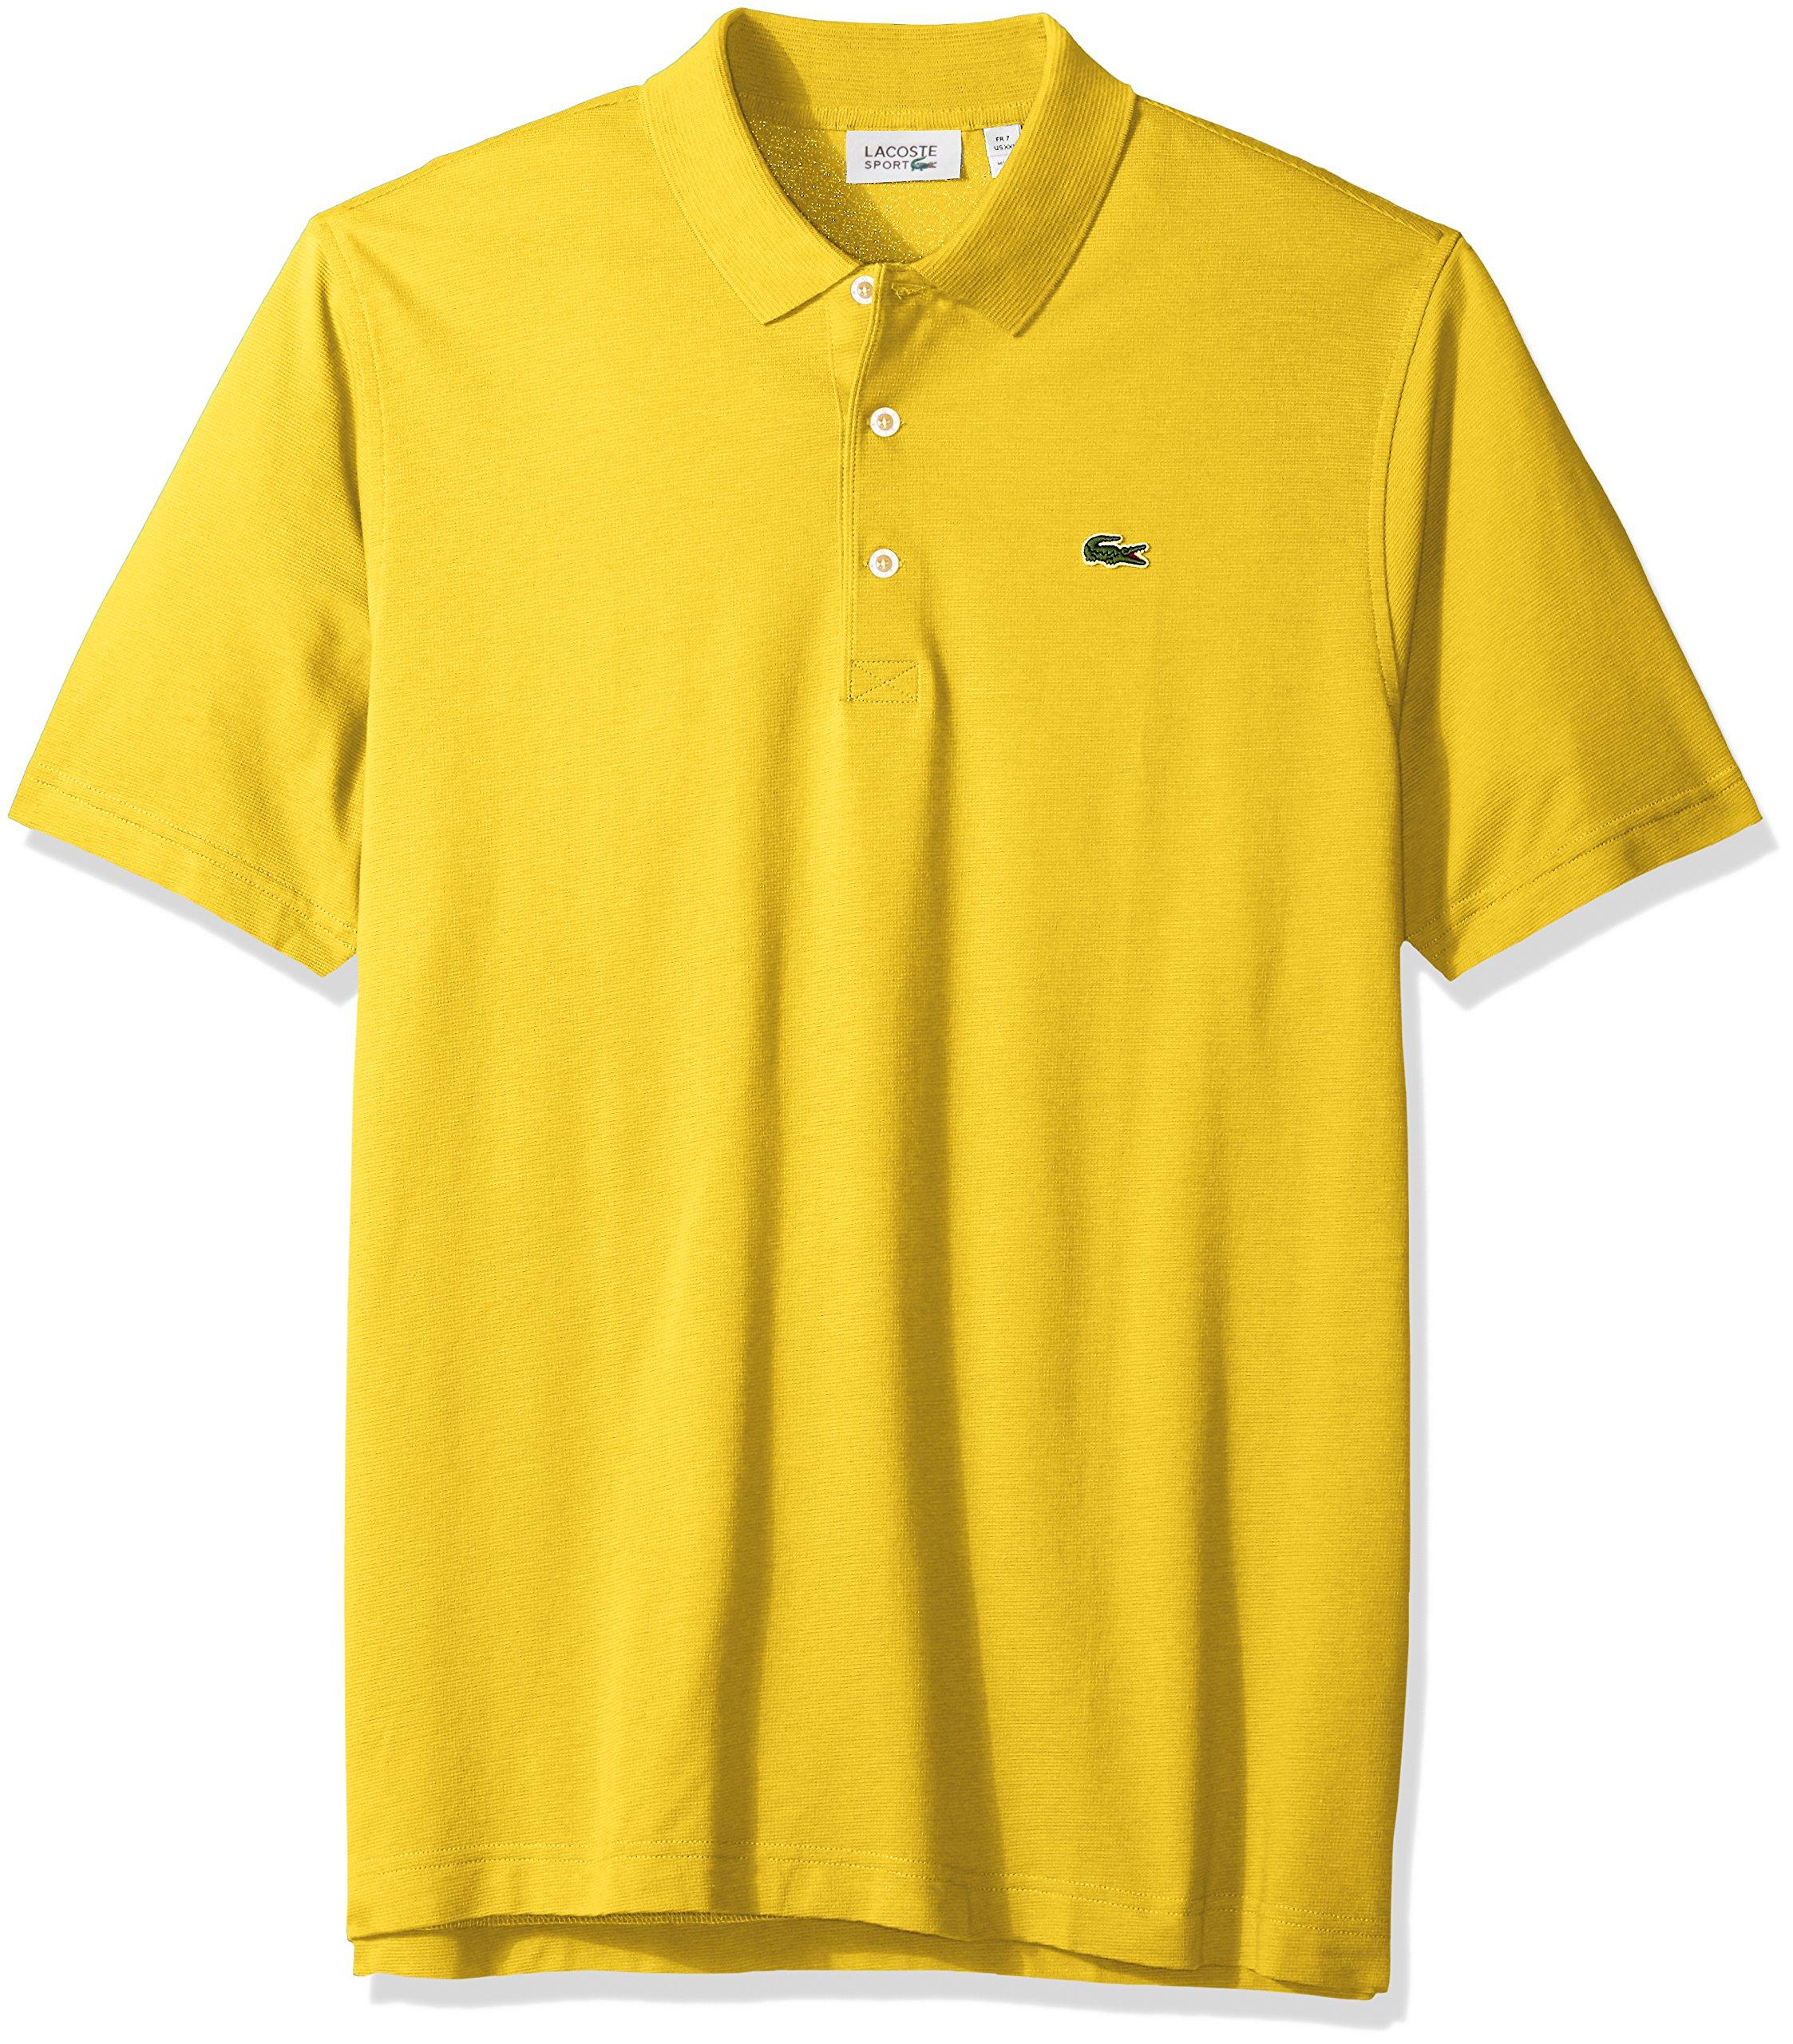 80b9e9f67 Galleon - Lacoste Men s Sport Short Sleeve Super Light Polo Shirt ...